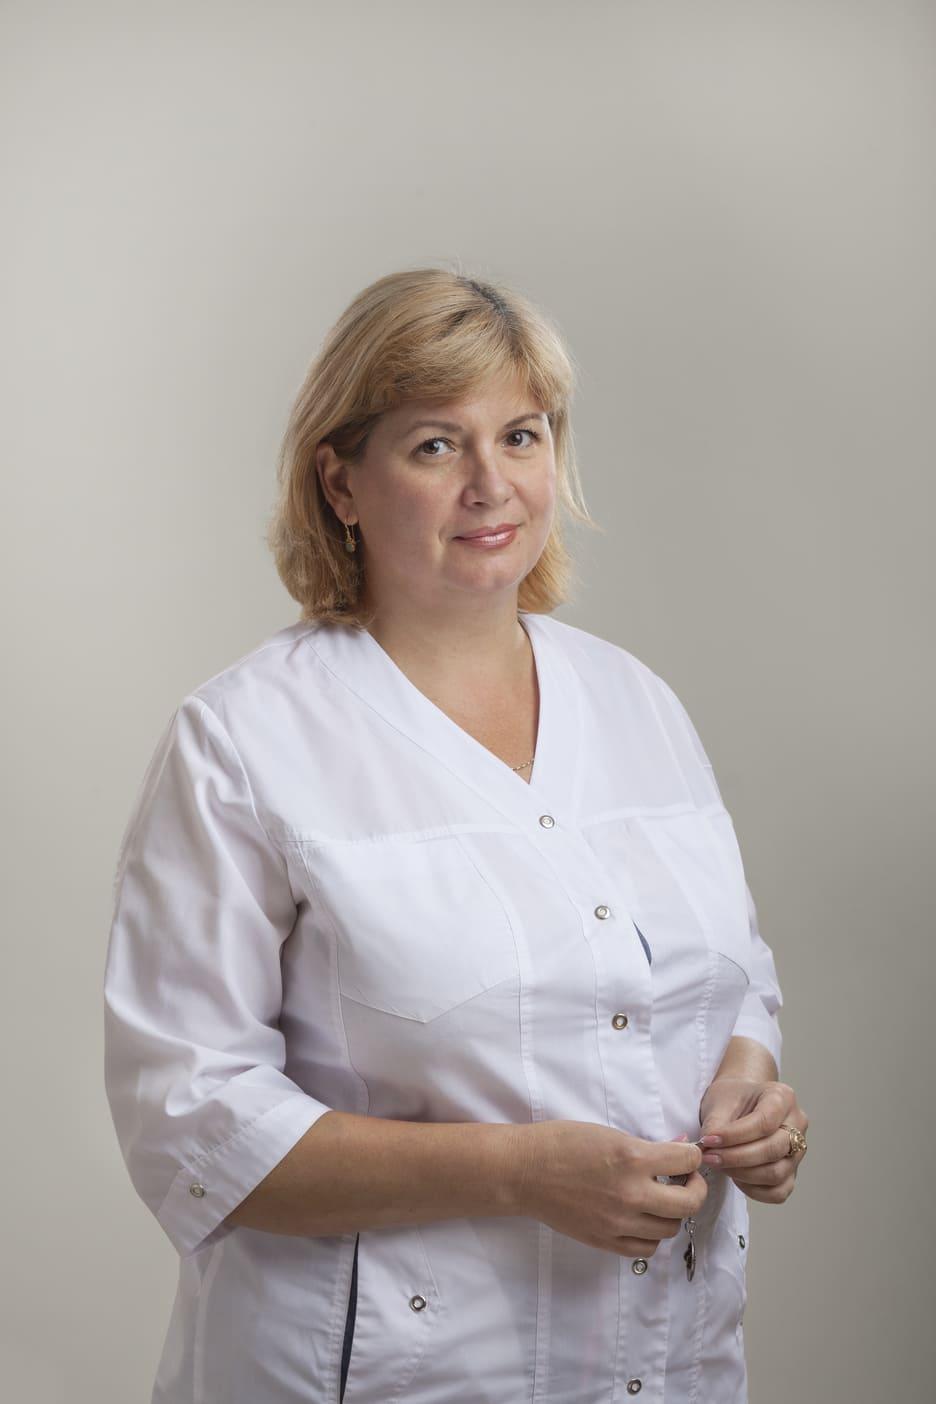 Самощенкова Анна Александровна